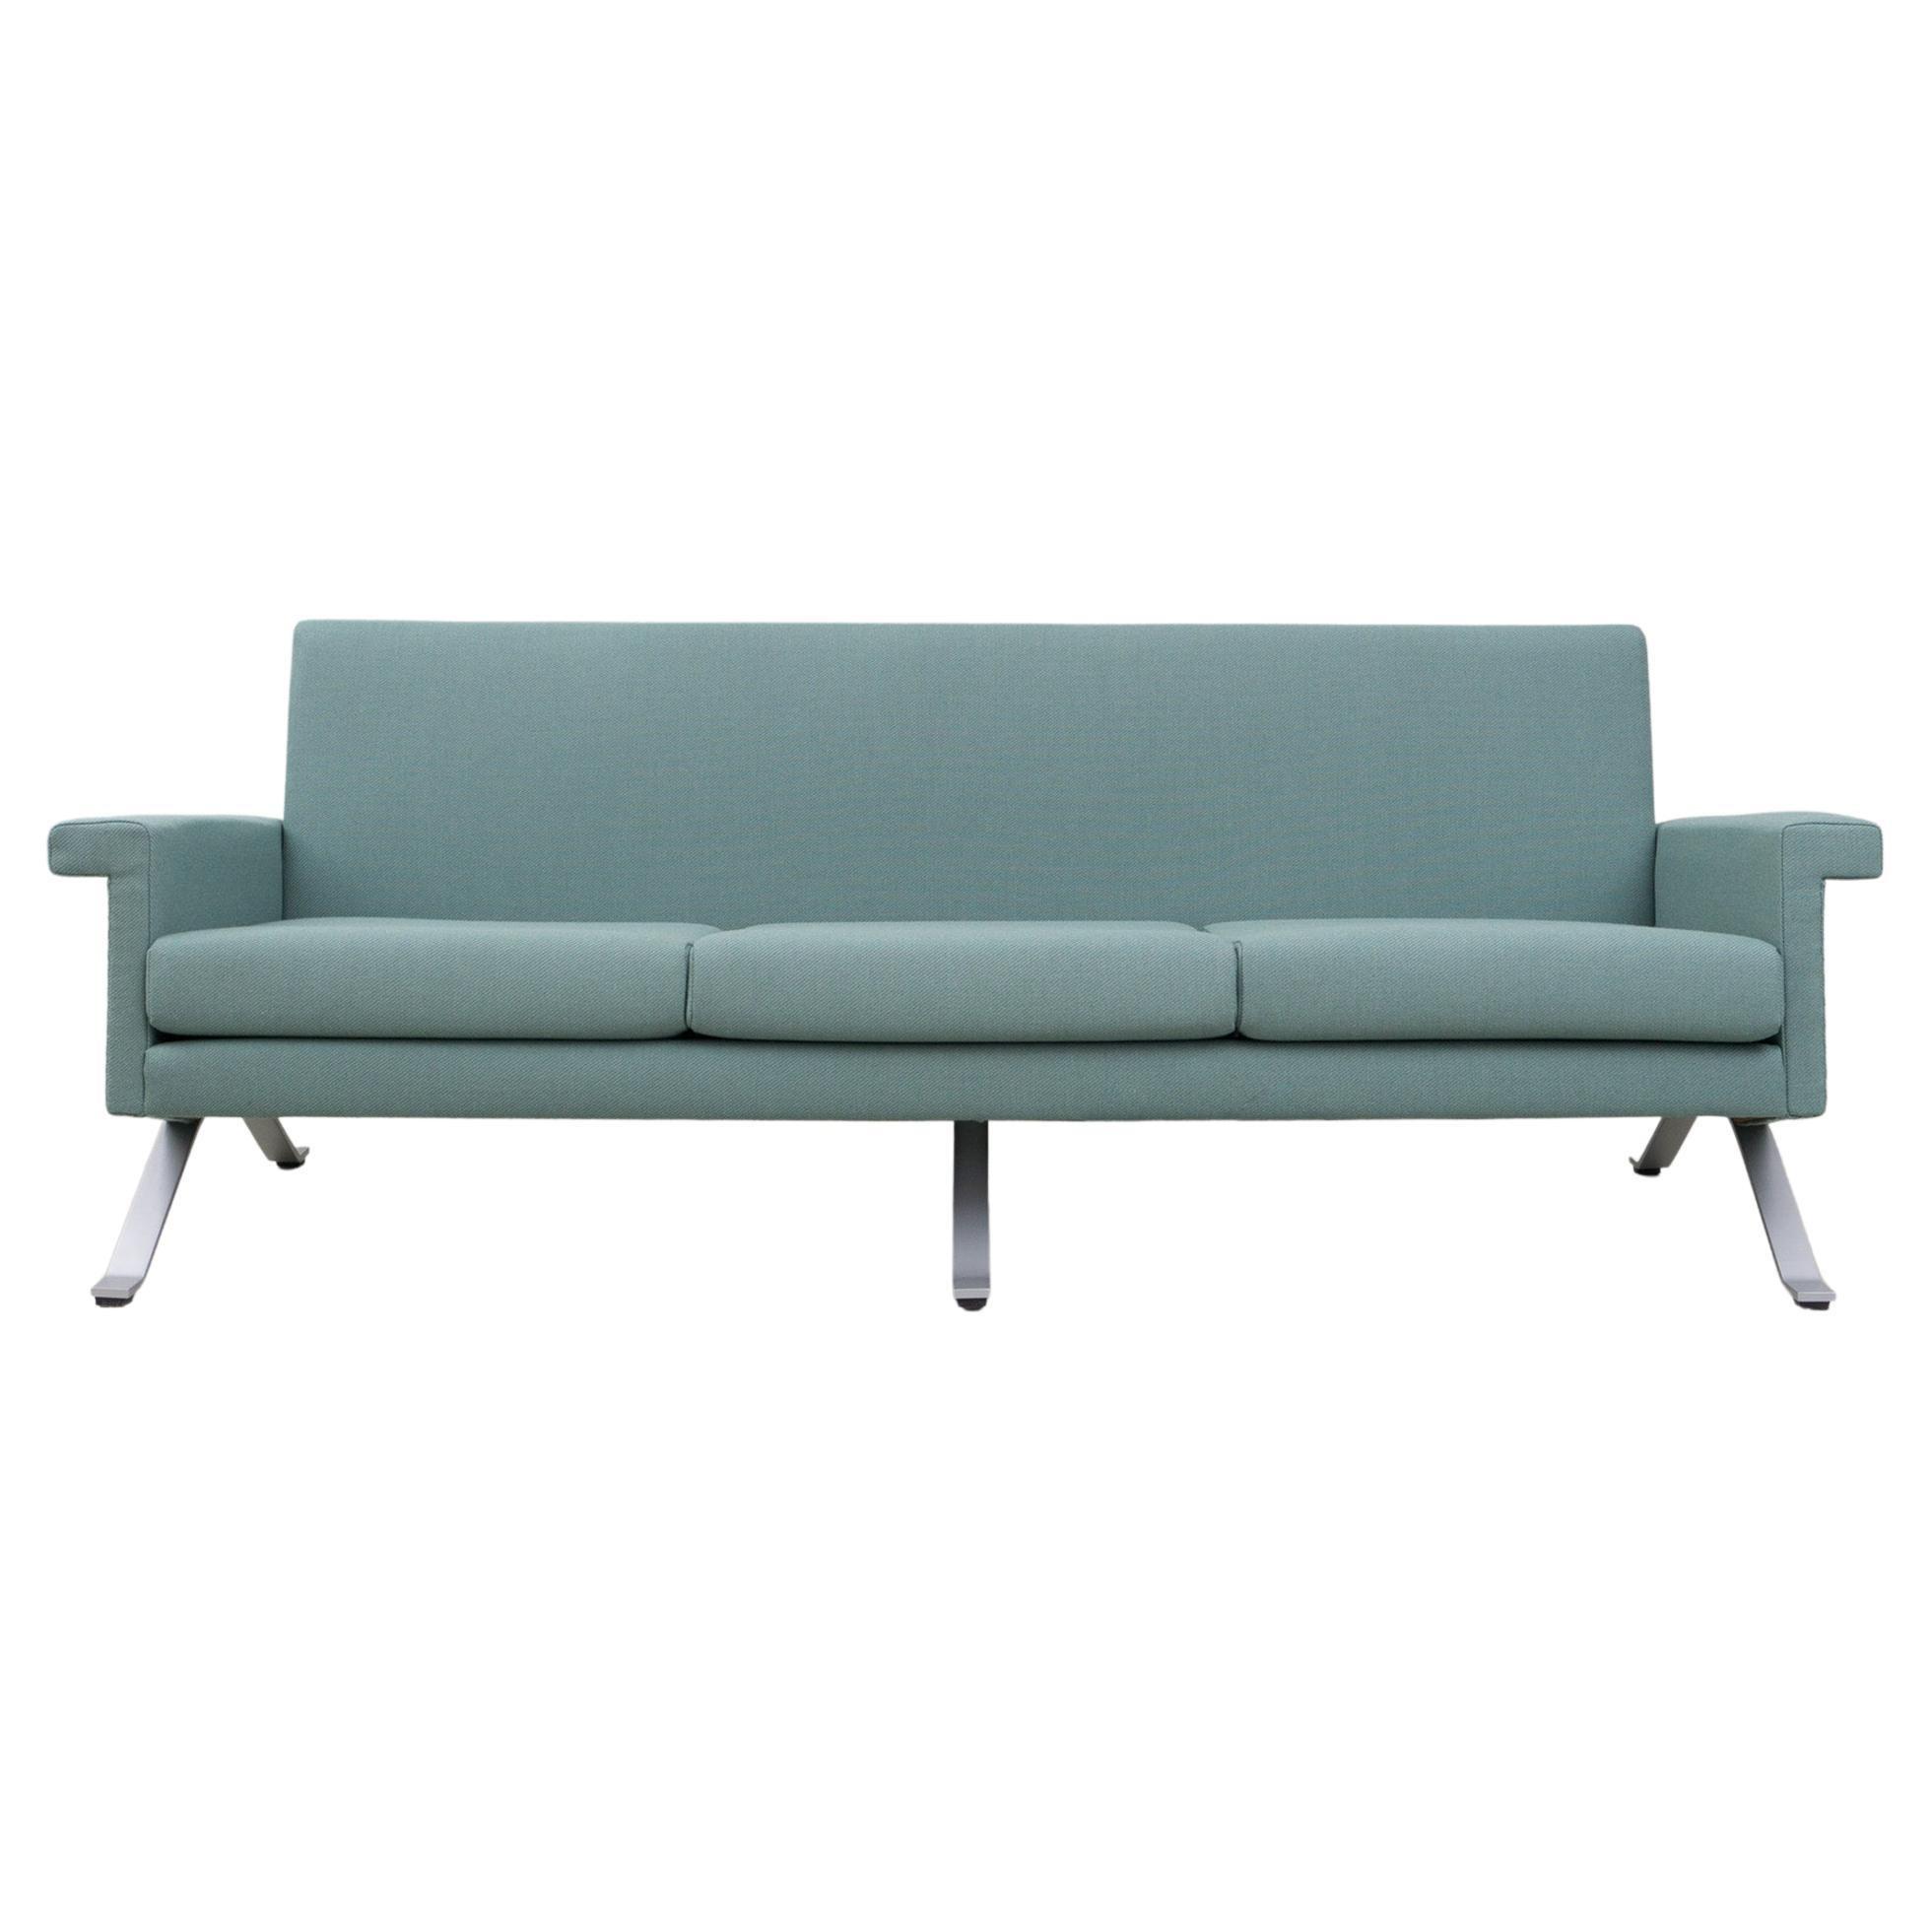 Sofa in Grey-Green, Model '875', Ico Parisi, 1960